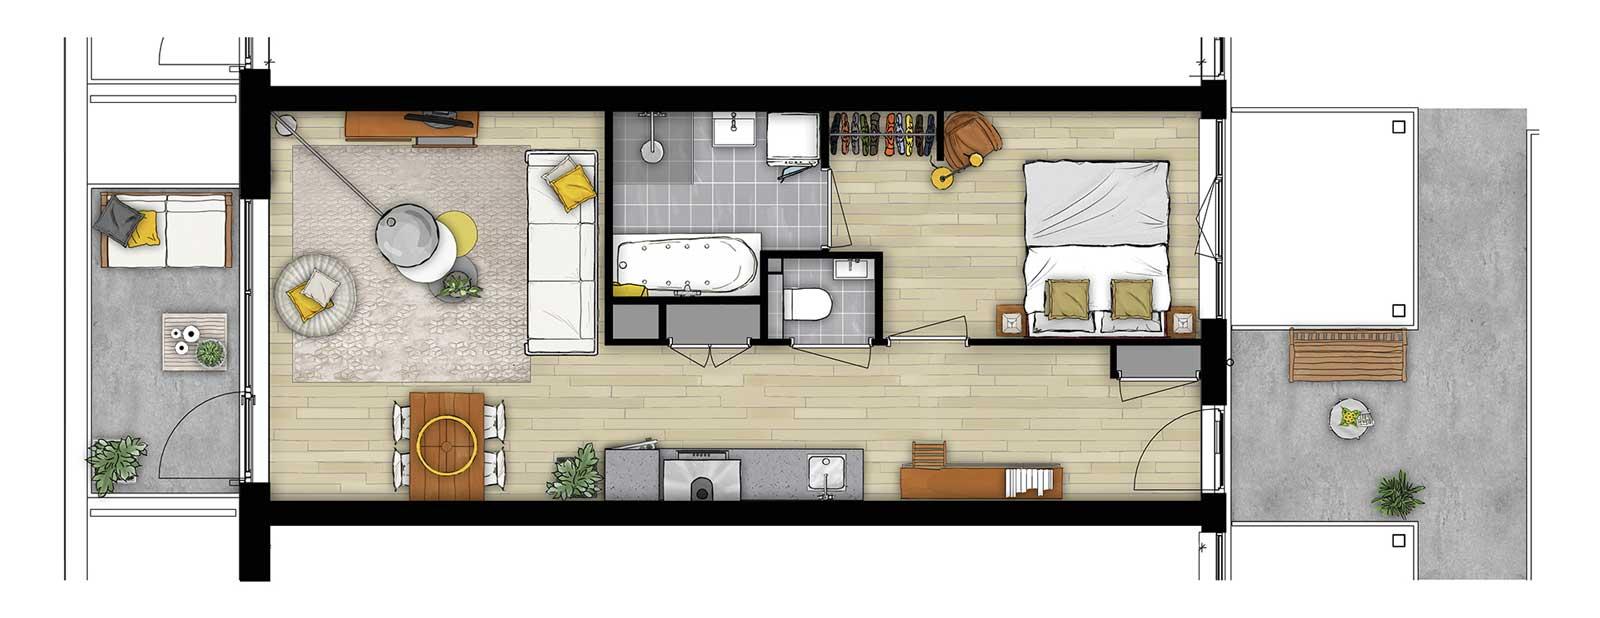 Appartementencomplex Welgelegen Blok G Utrecht - impressie plattegrond type B